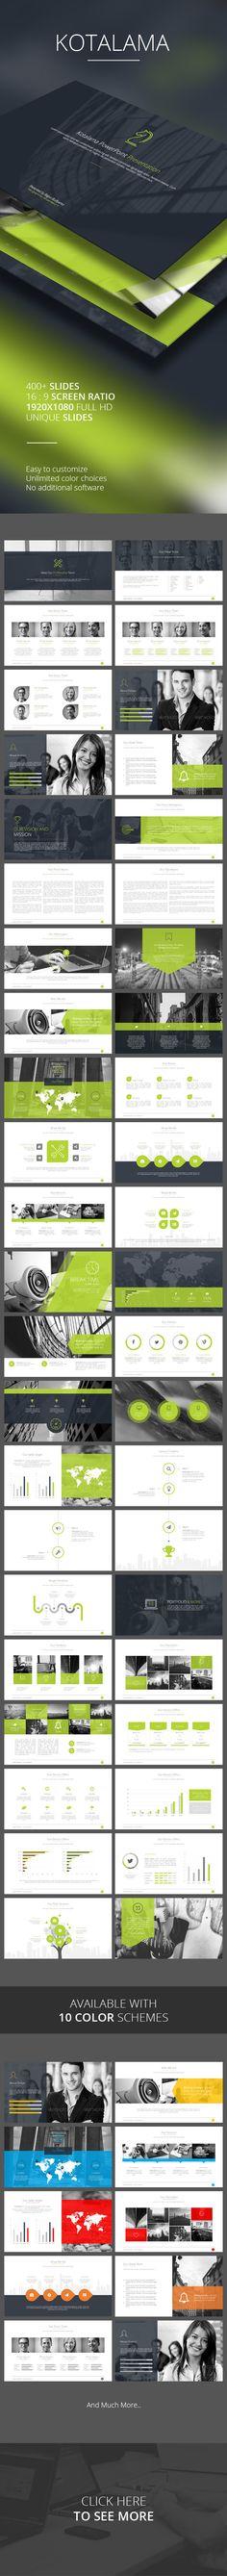 Kotalama PowerPoint Template - PowerPoint Templates Presentation Templates